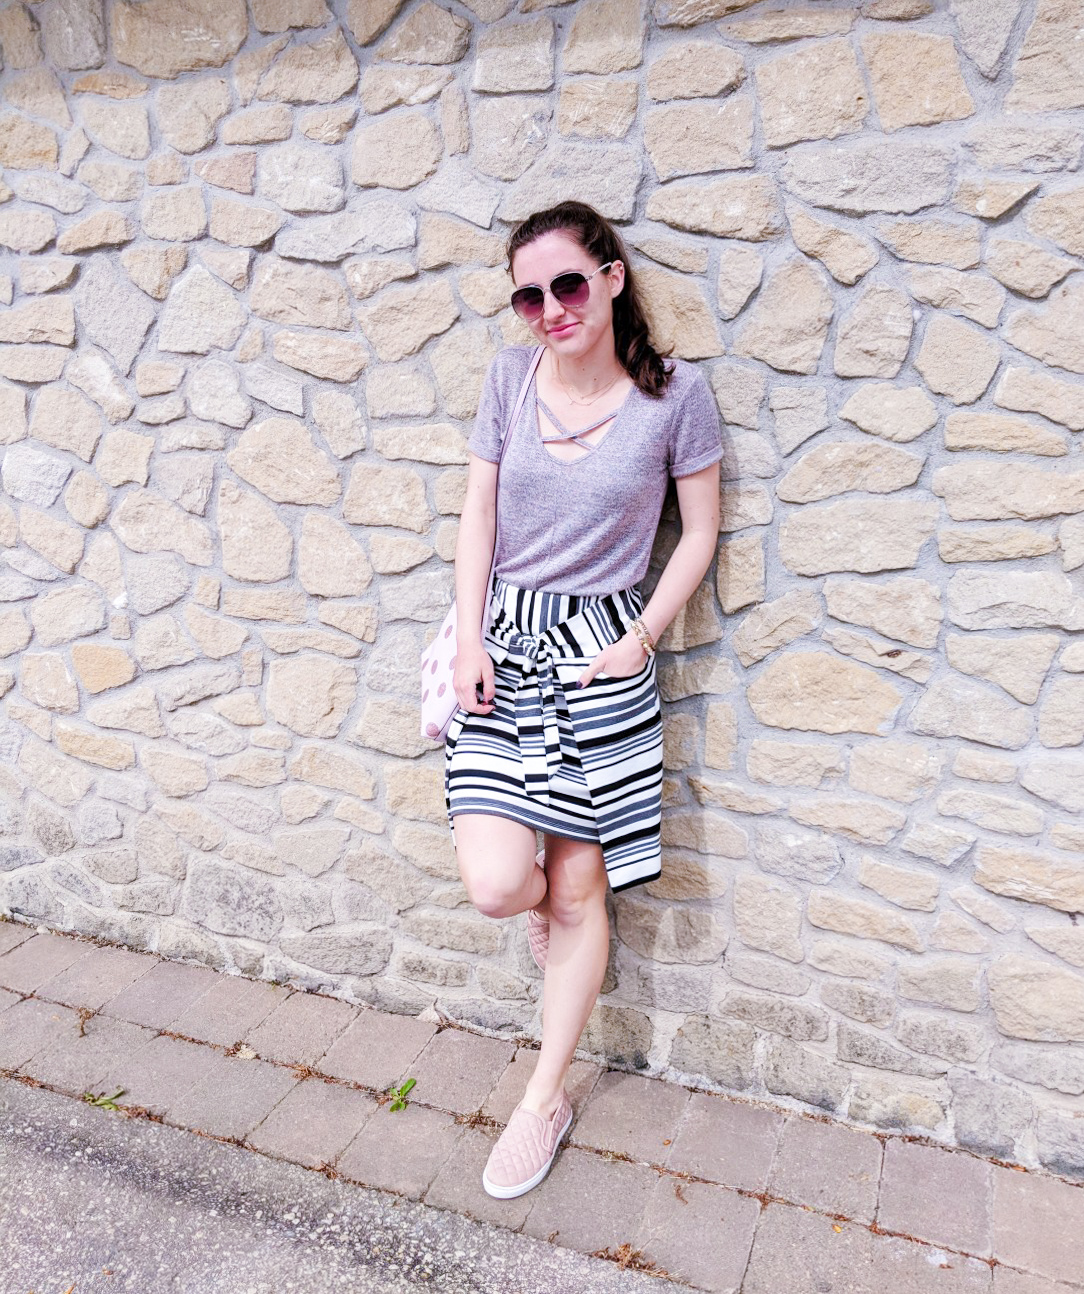 blush top, striped skirt, Cabi clothing, blush sneakers, pattern mixing